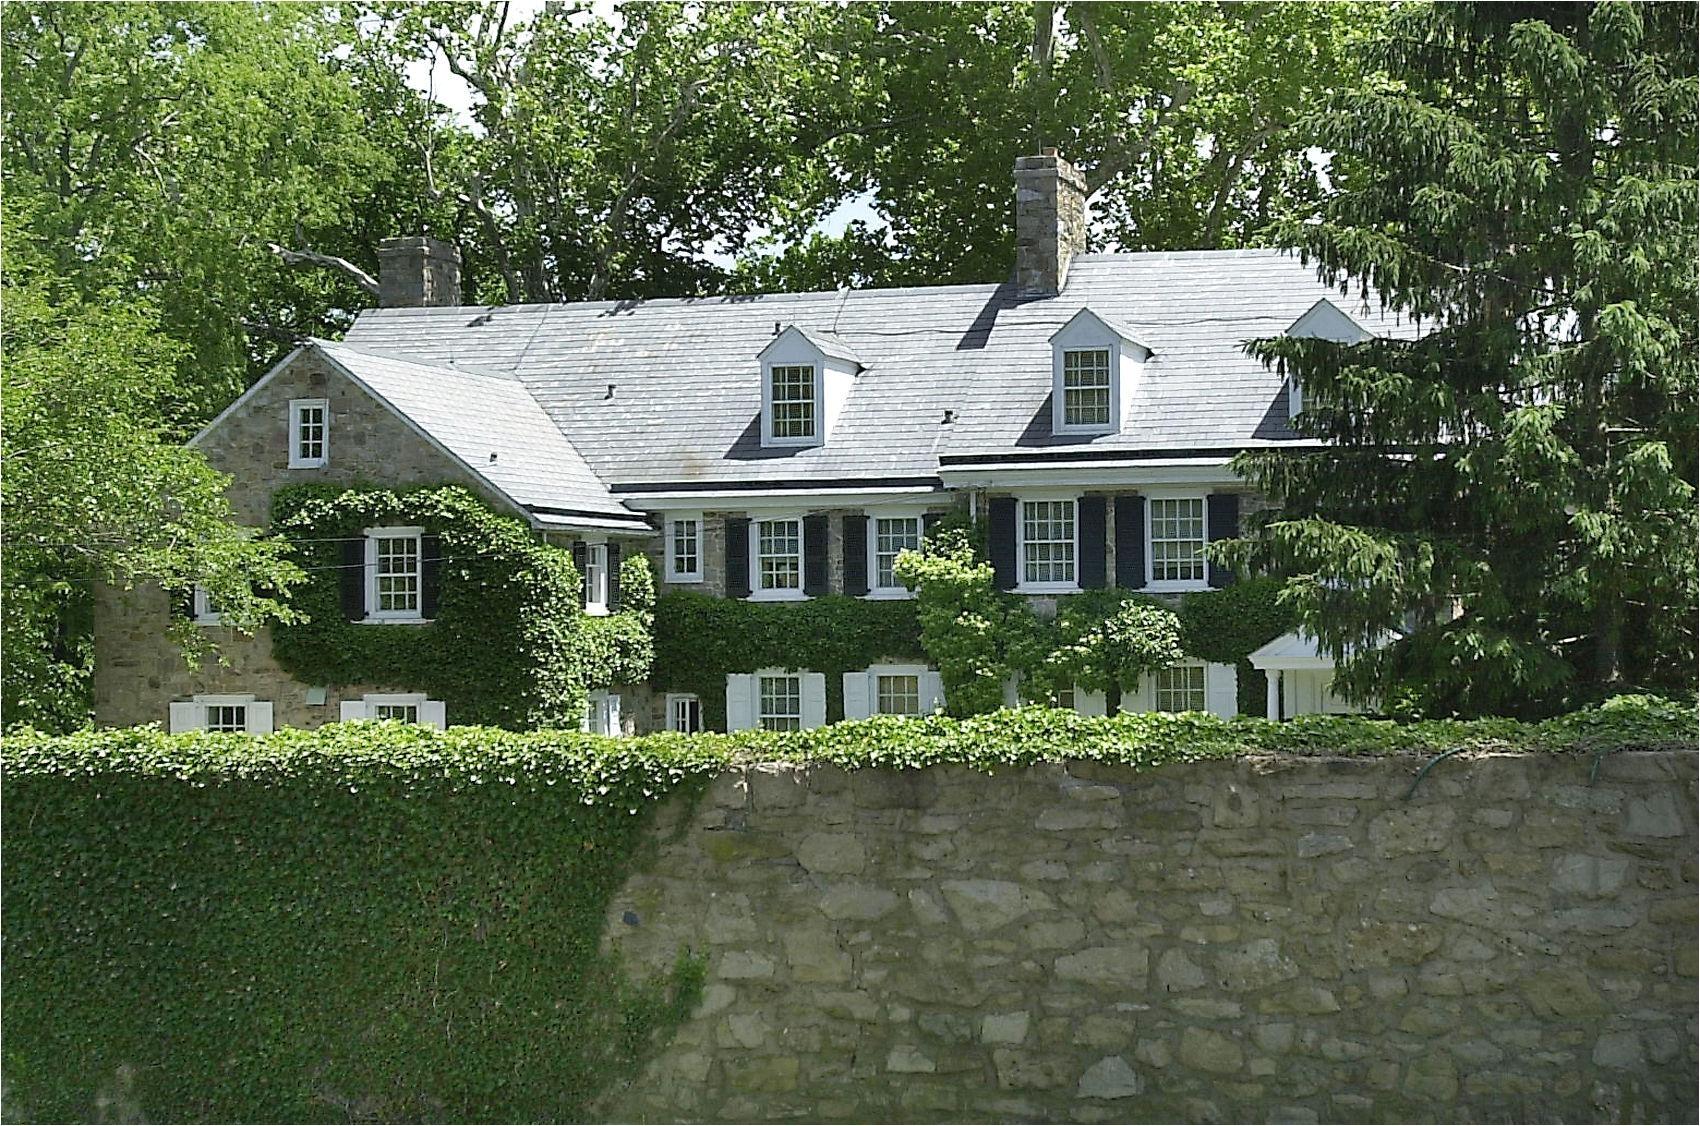 historic buckingham property for sale news the intelligencer doylestown pa